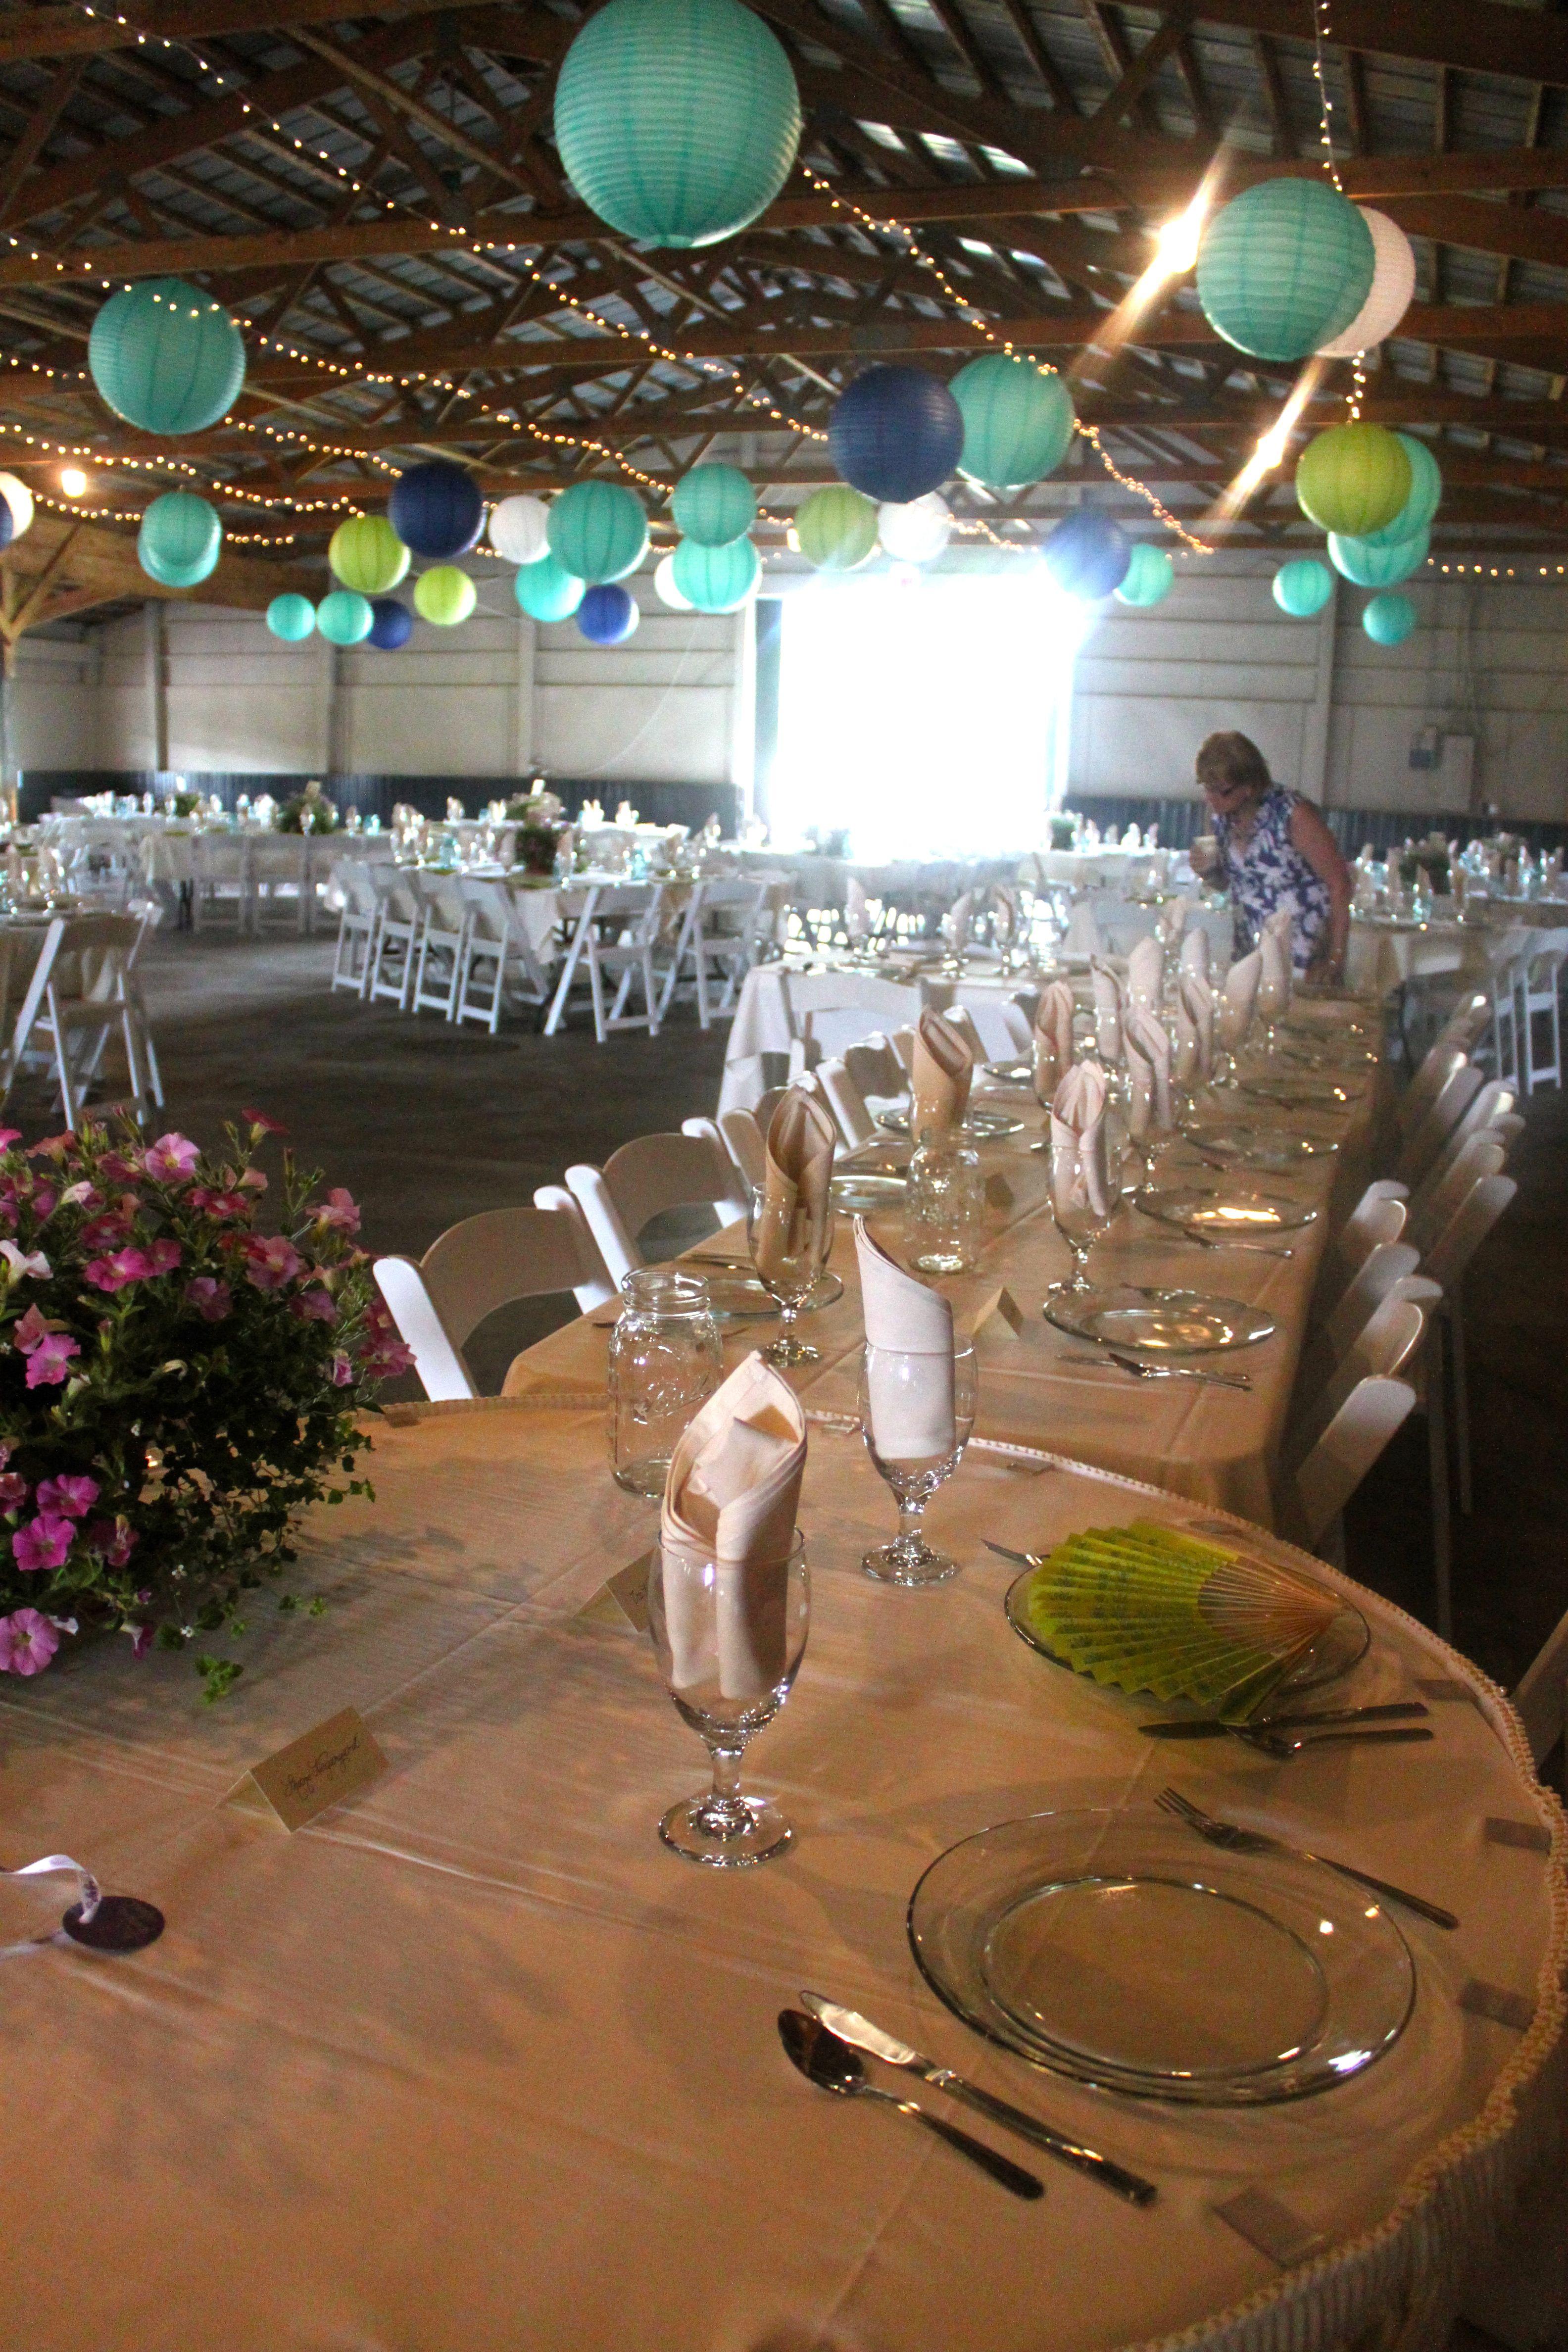 Barn wedding table settings  photo Tiffany Hedge  TableScapesTable Settings  Pinterest